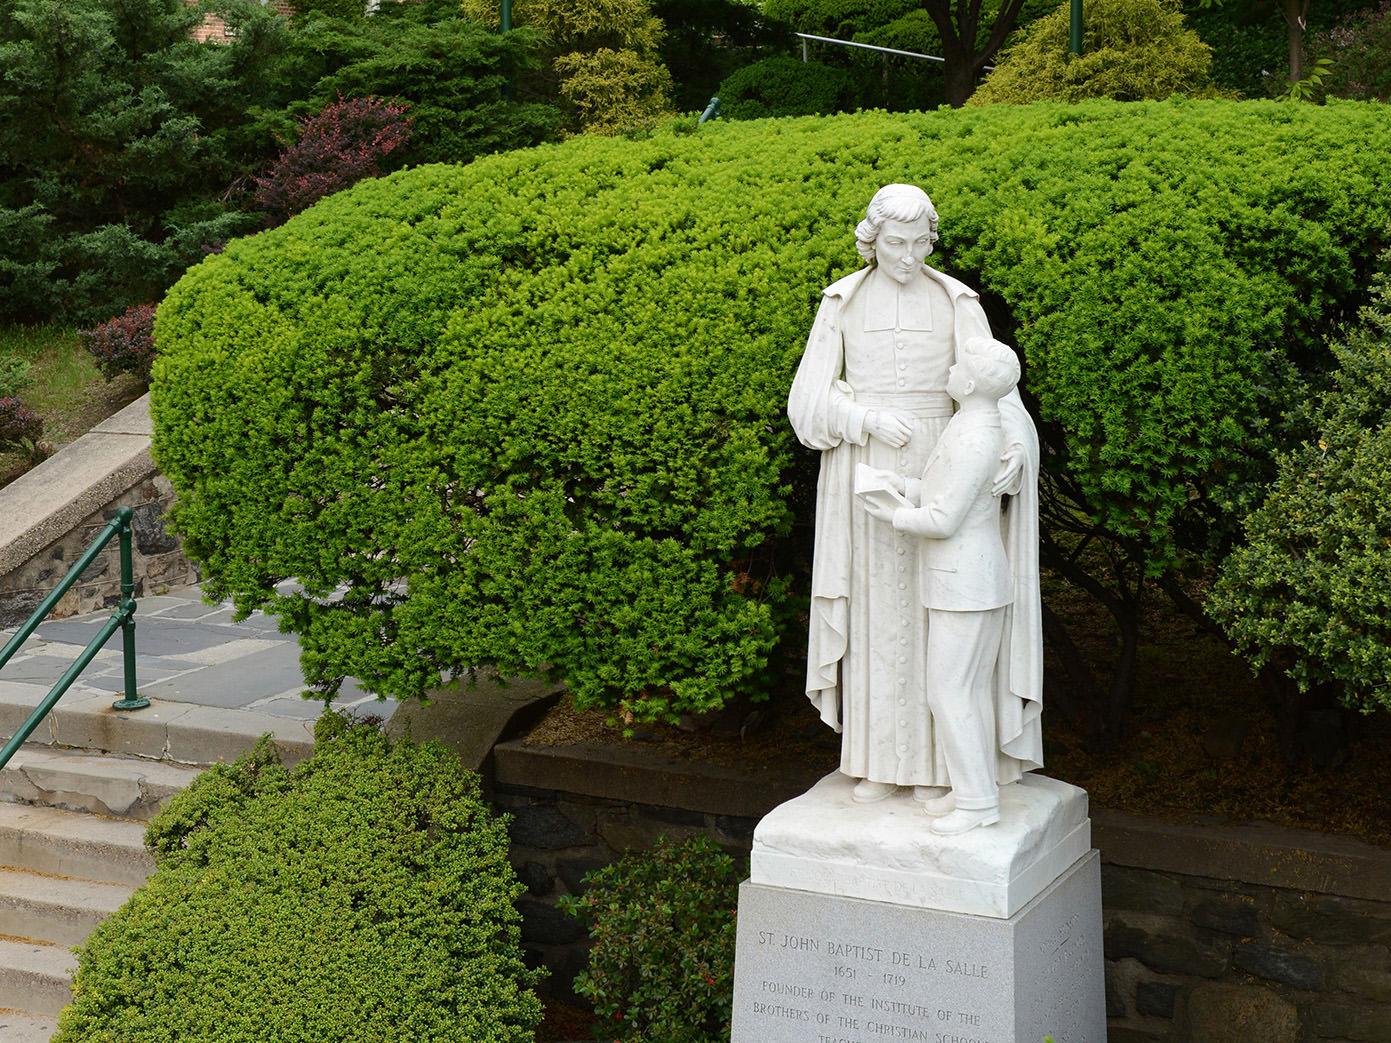 St. John Baptiste De La Salle